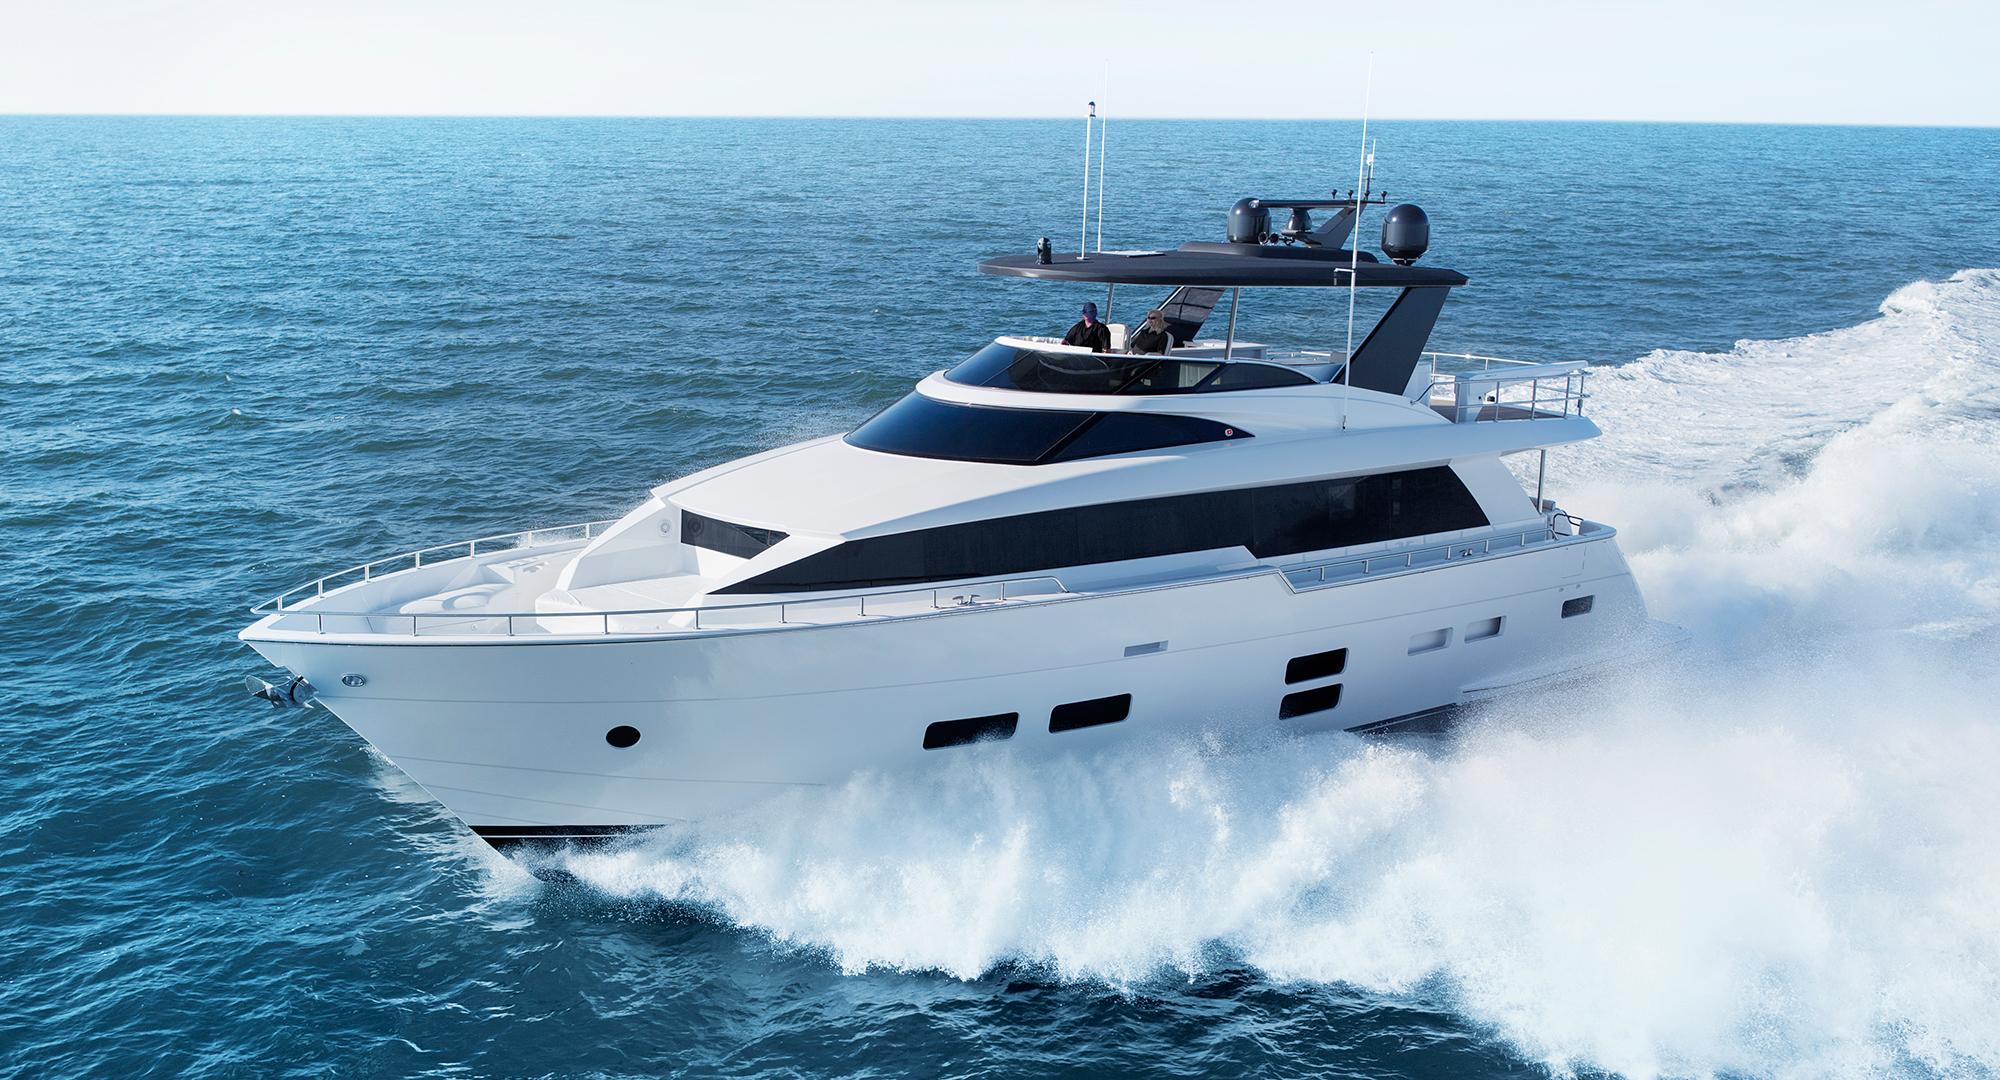 Hatteras yachts m75 panacera for Hatteras 70 motor yacht